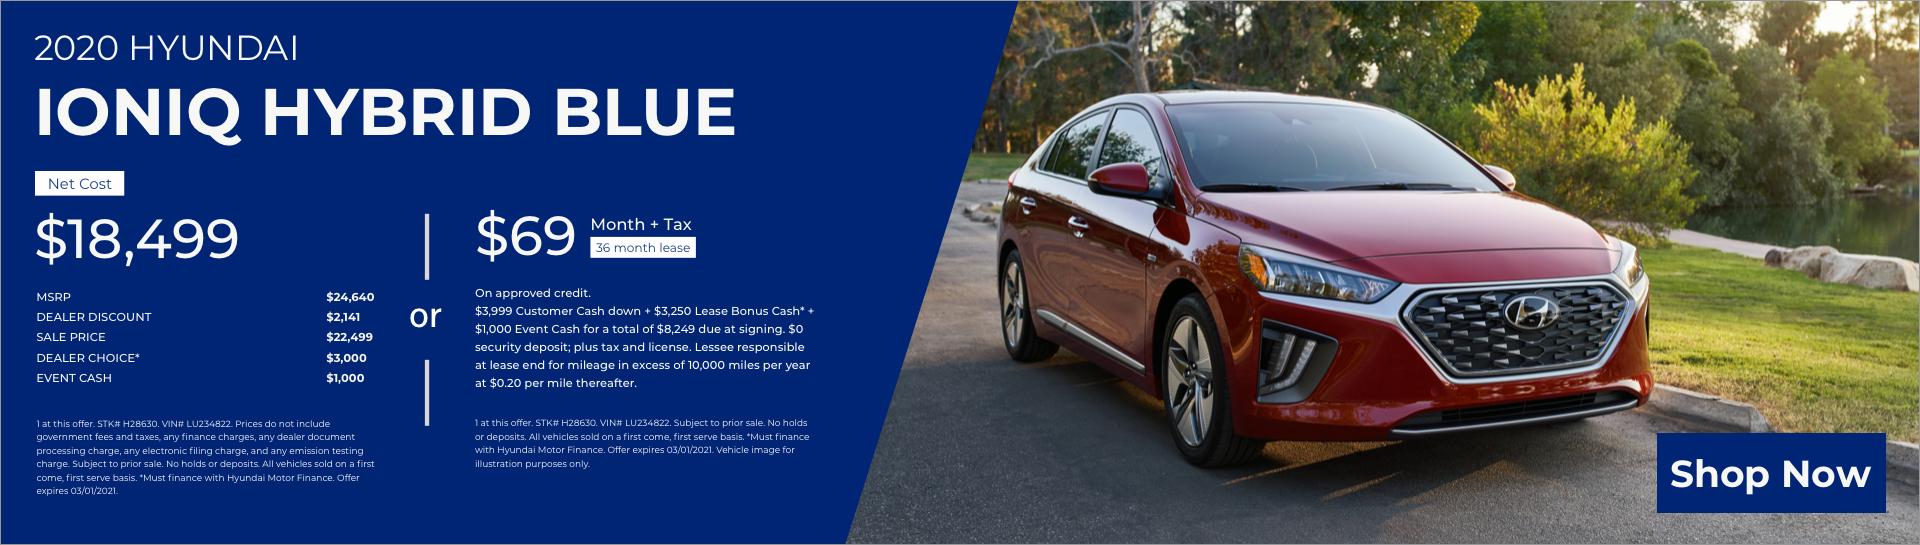 Feb 2020 Hyundai Ioniq Hybrid